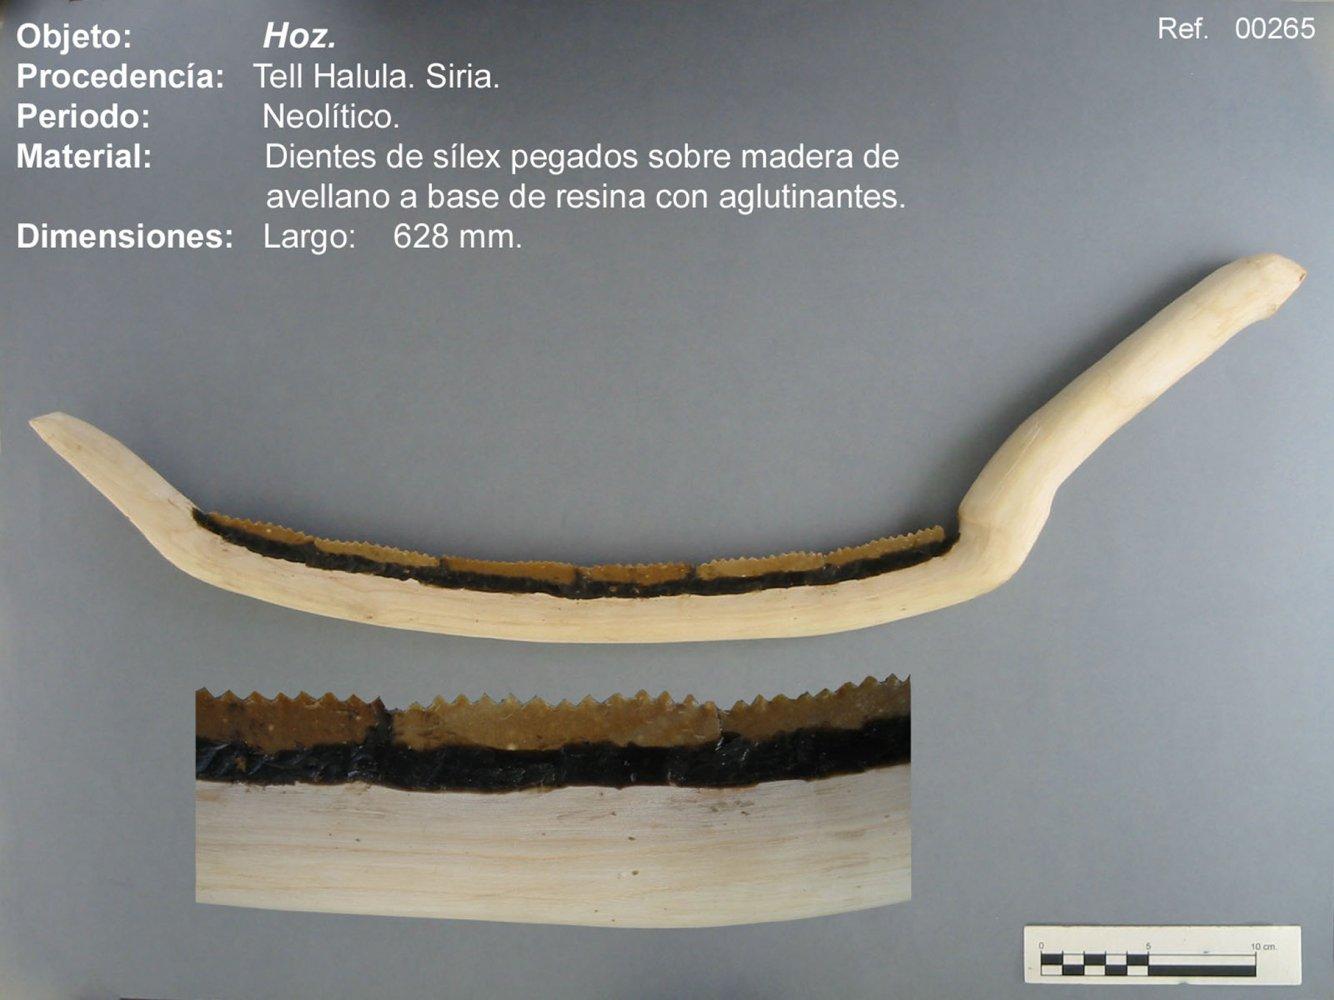 00265 Hoz de Tell Halula